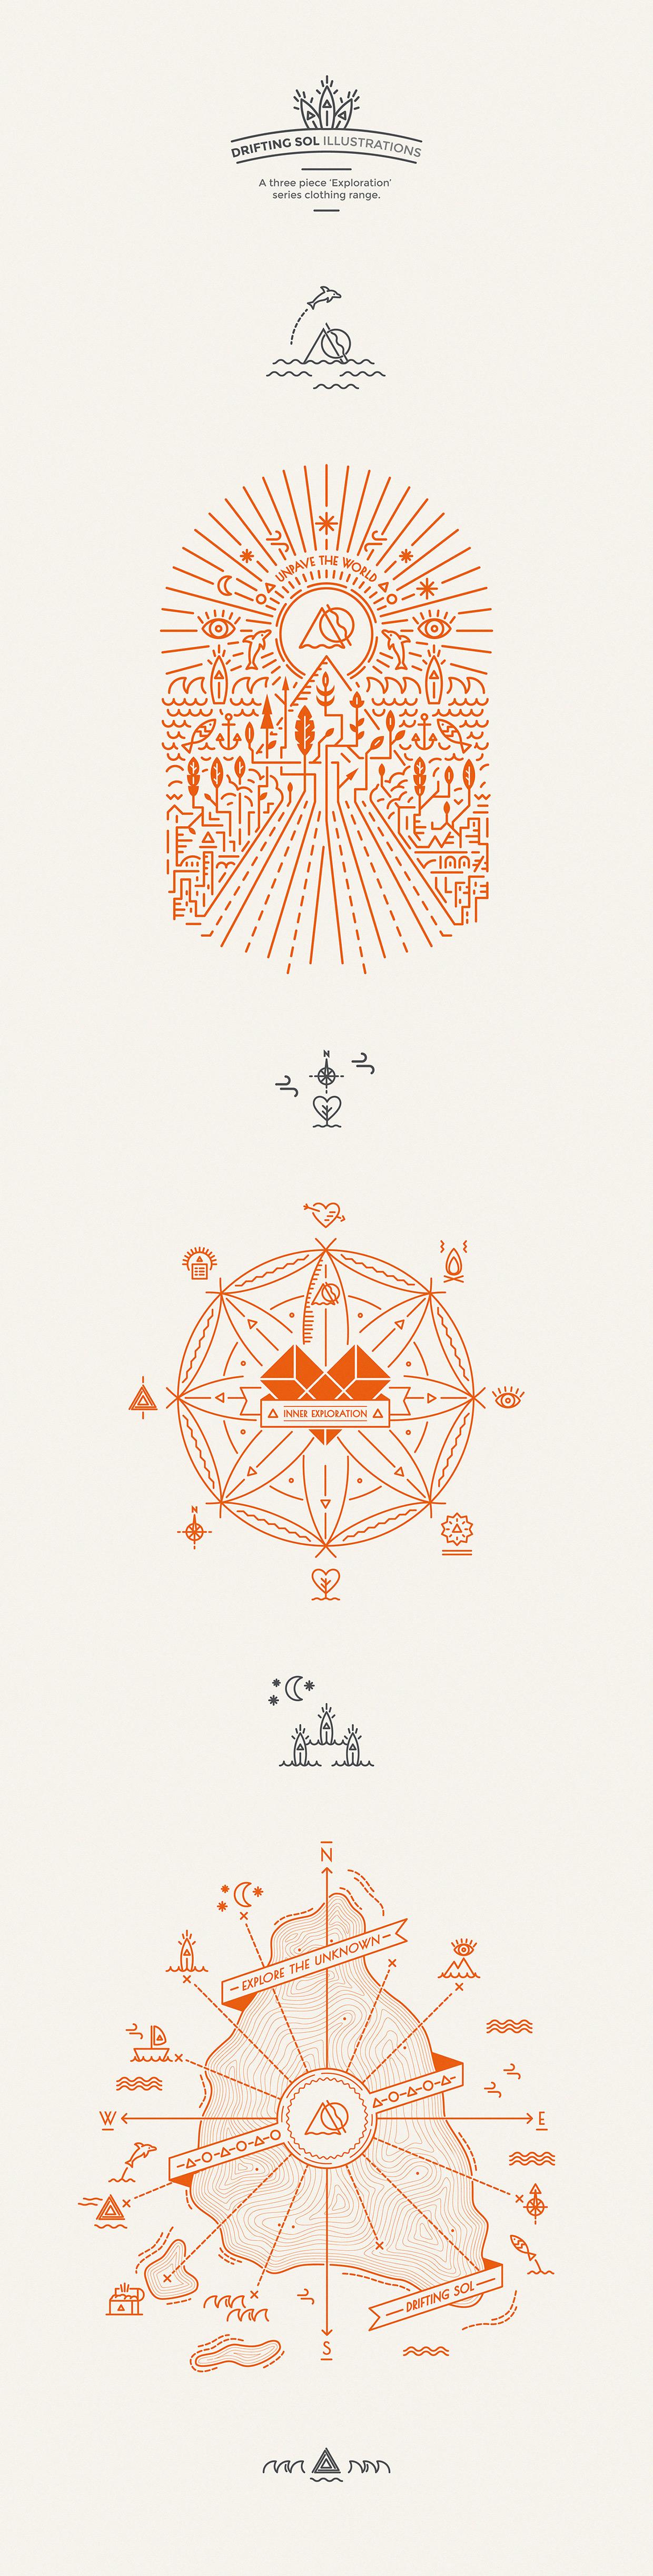 Drifting Sol | Illustrations on Behance